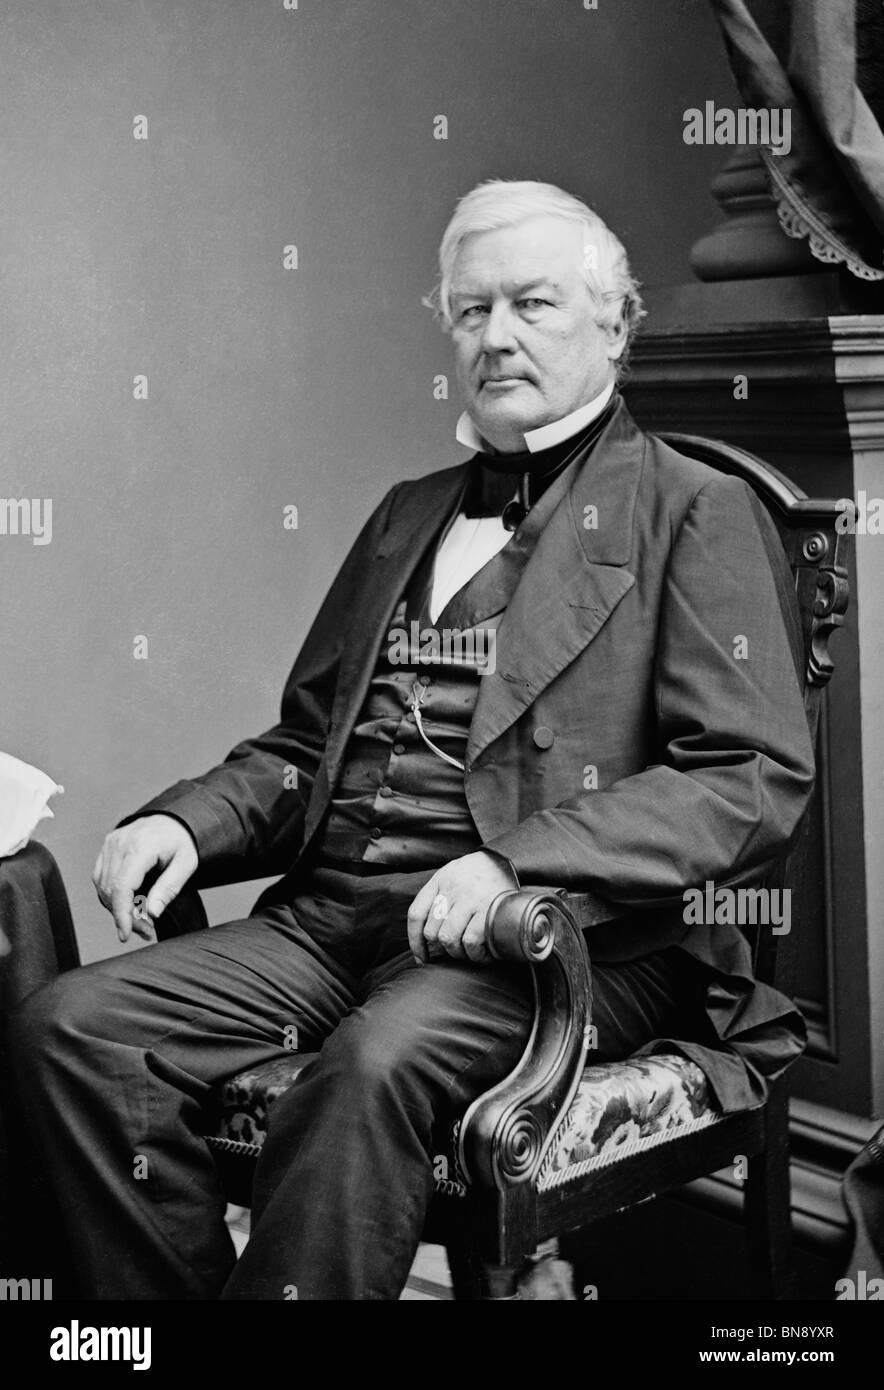 Portrait photo circa 1850s of Millard Fillmore (1800 - 1874) - the 13th US President (1850 - 1853). Stock Photo